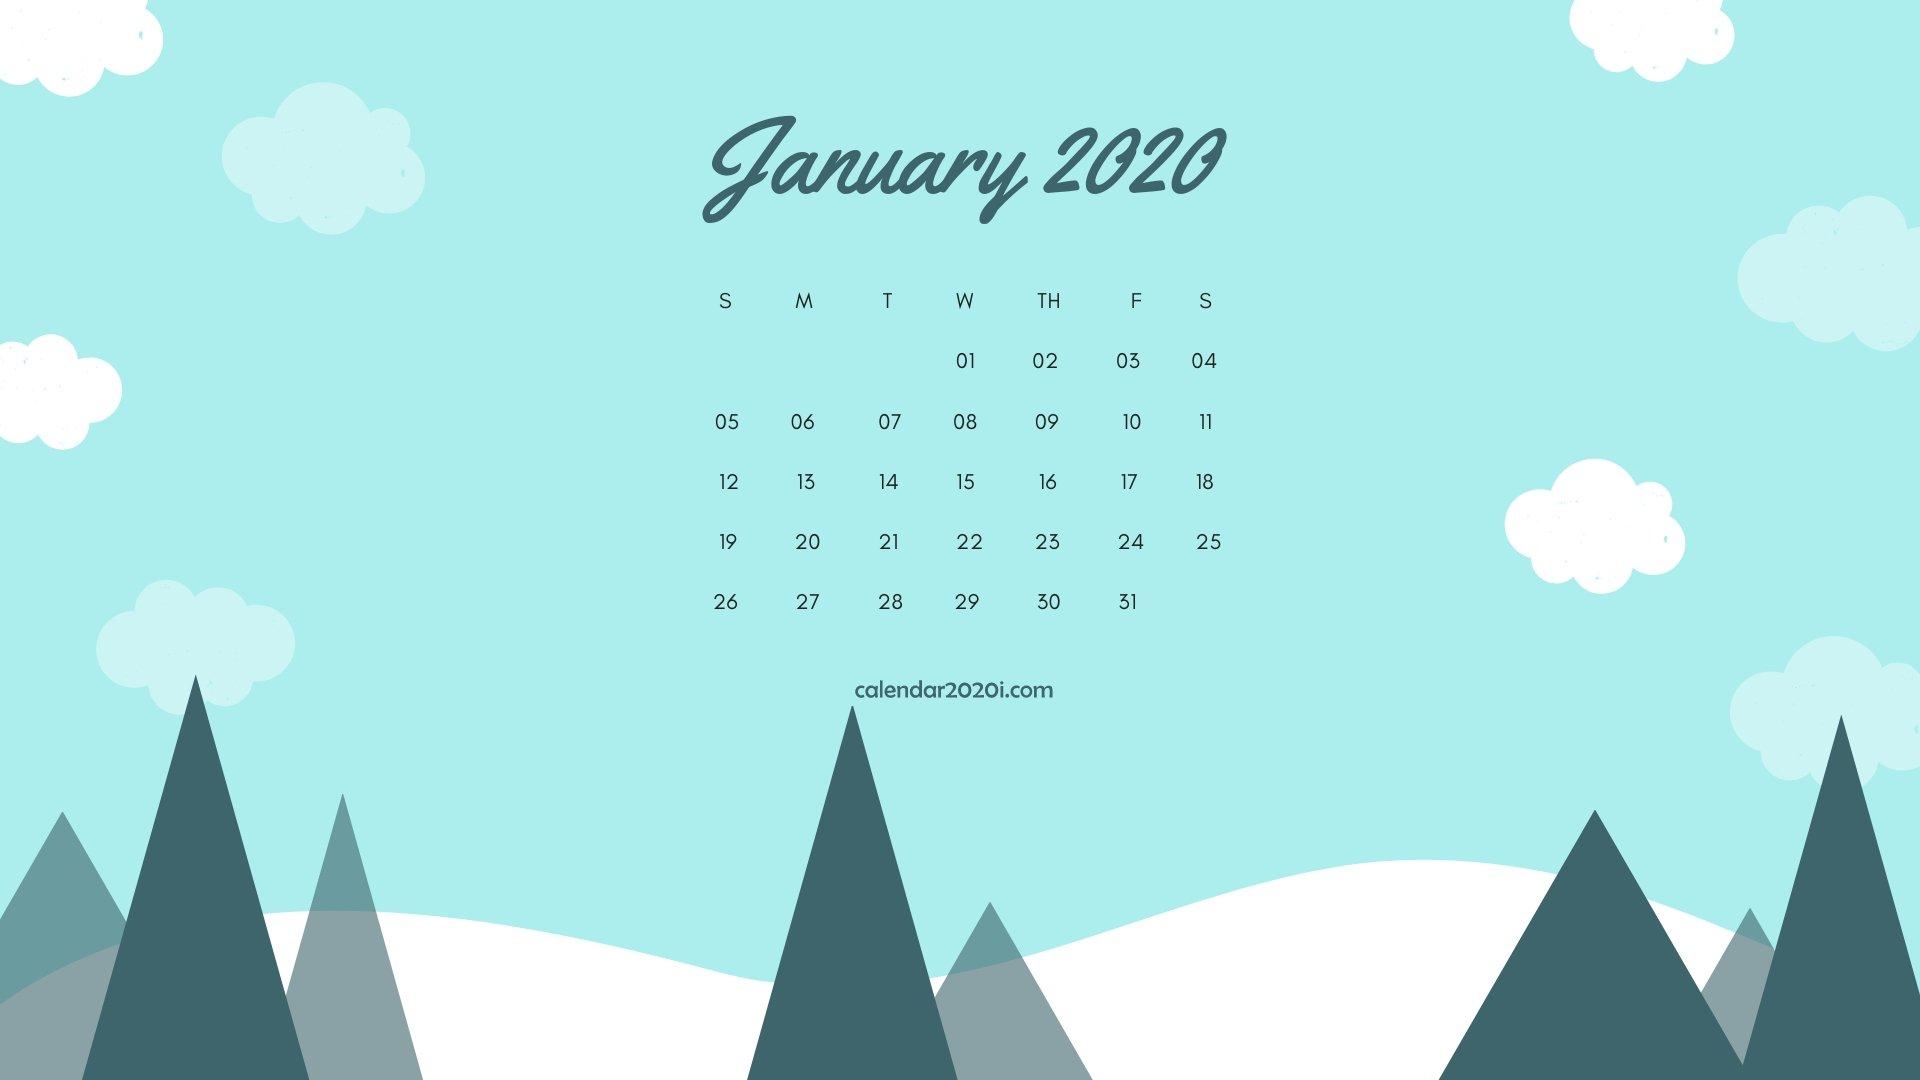 January 2020 Calendar Desktop Wallpaper